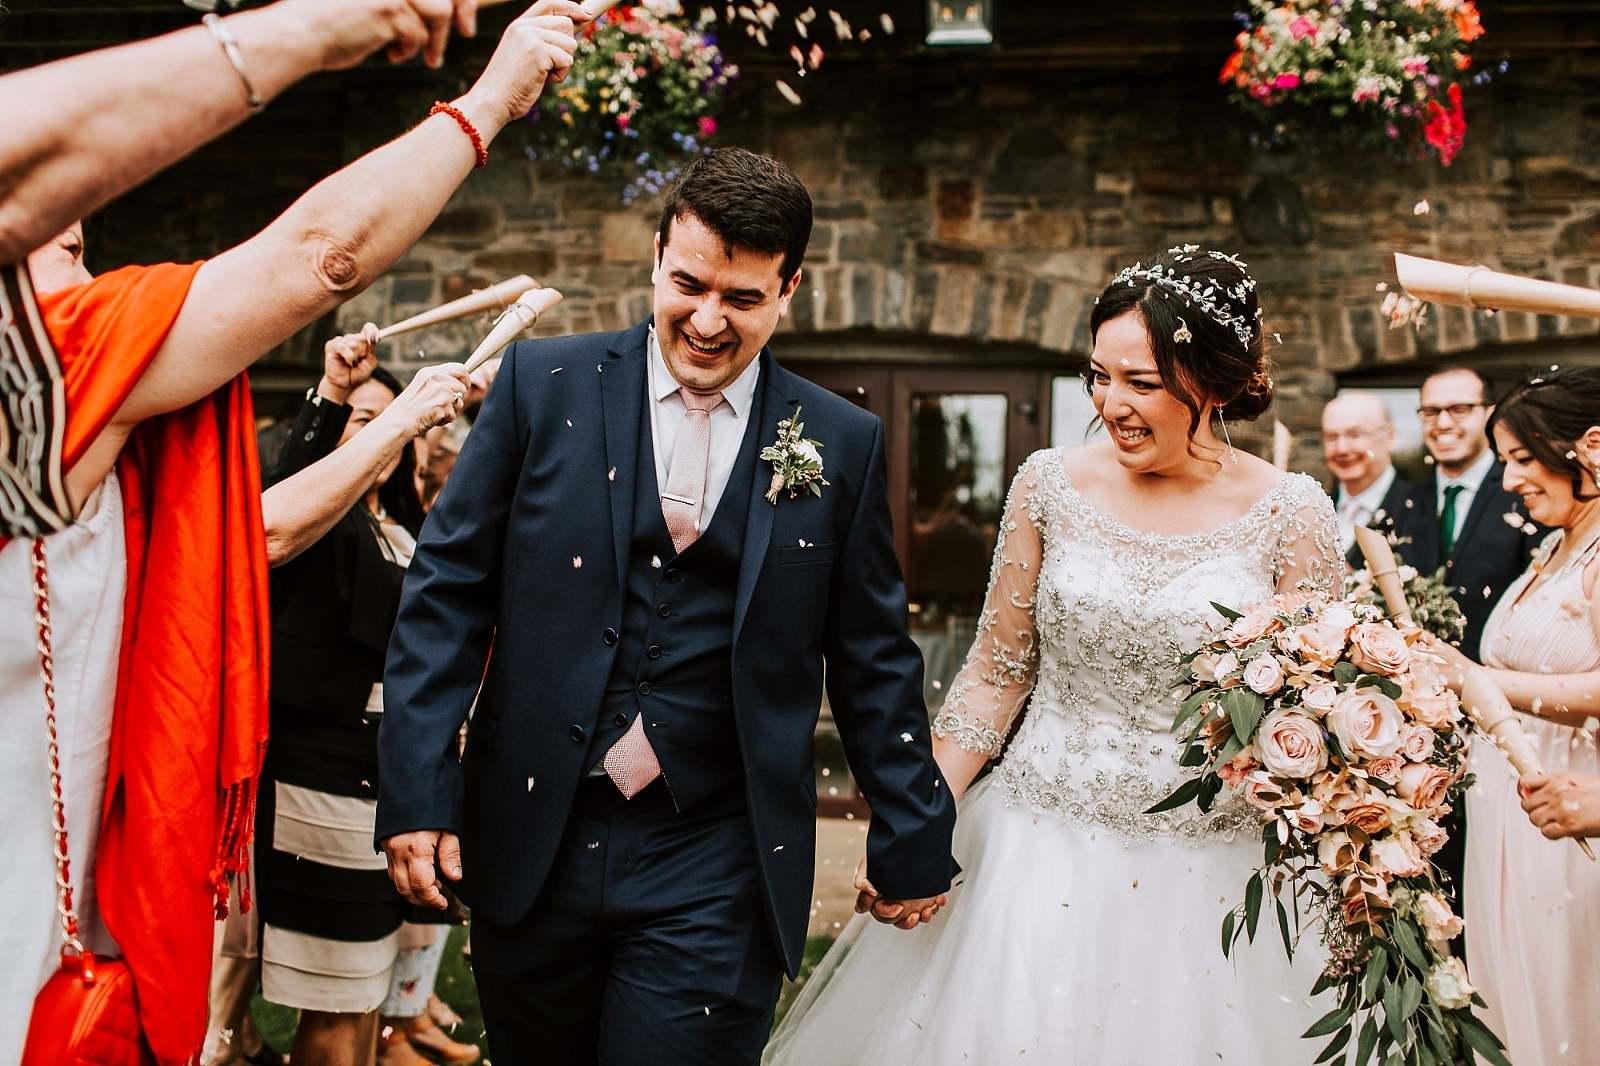 Canada Lake Lodge Wedding Cardiff South Wales Photographer Sheetal Varsani